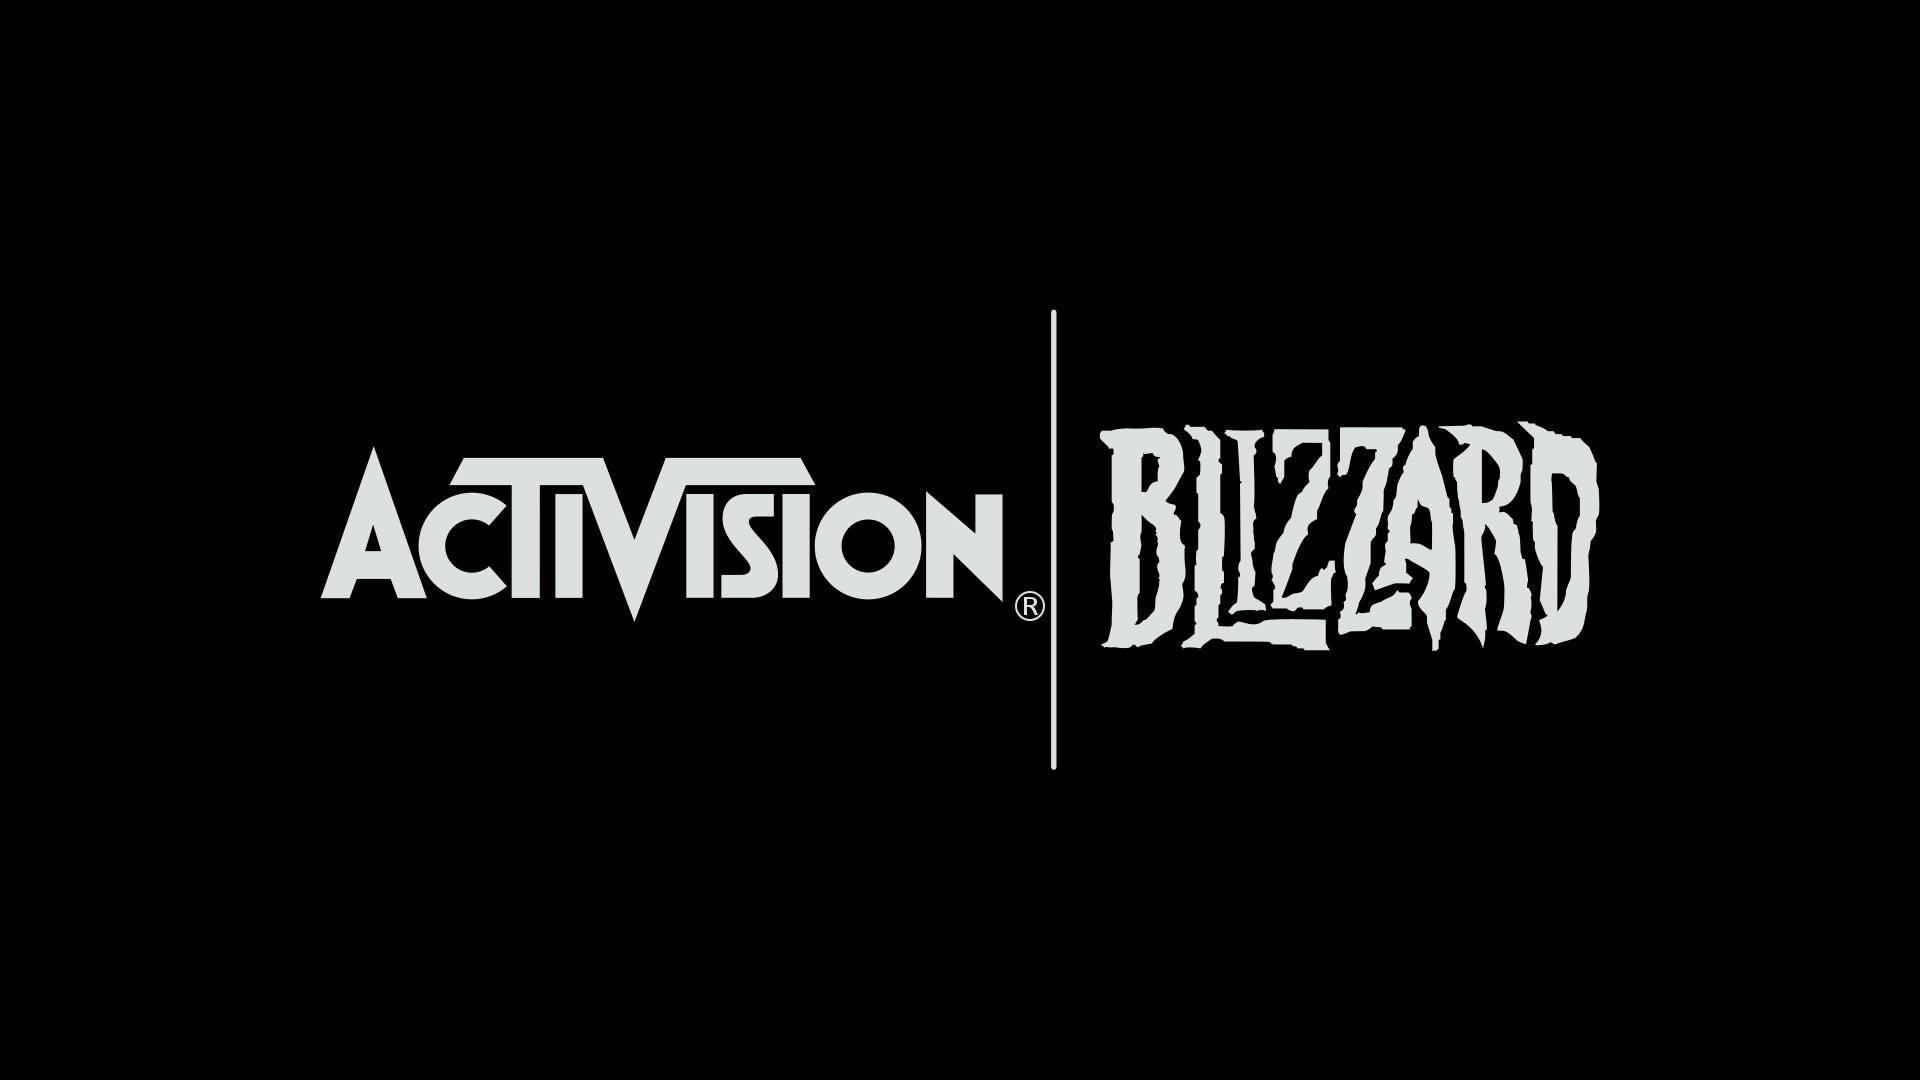 Activision Blizzard aangeklaagd vanwege seksueel wangedrag